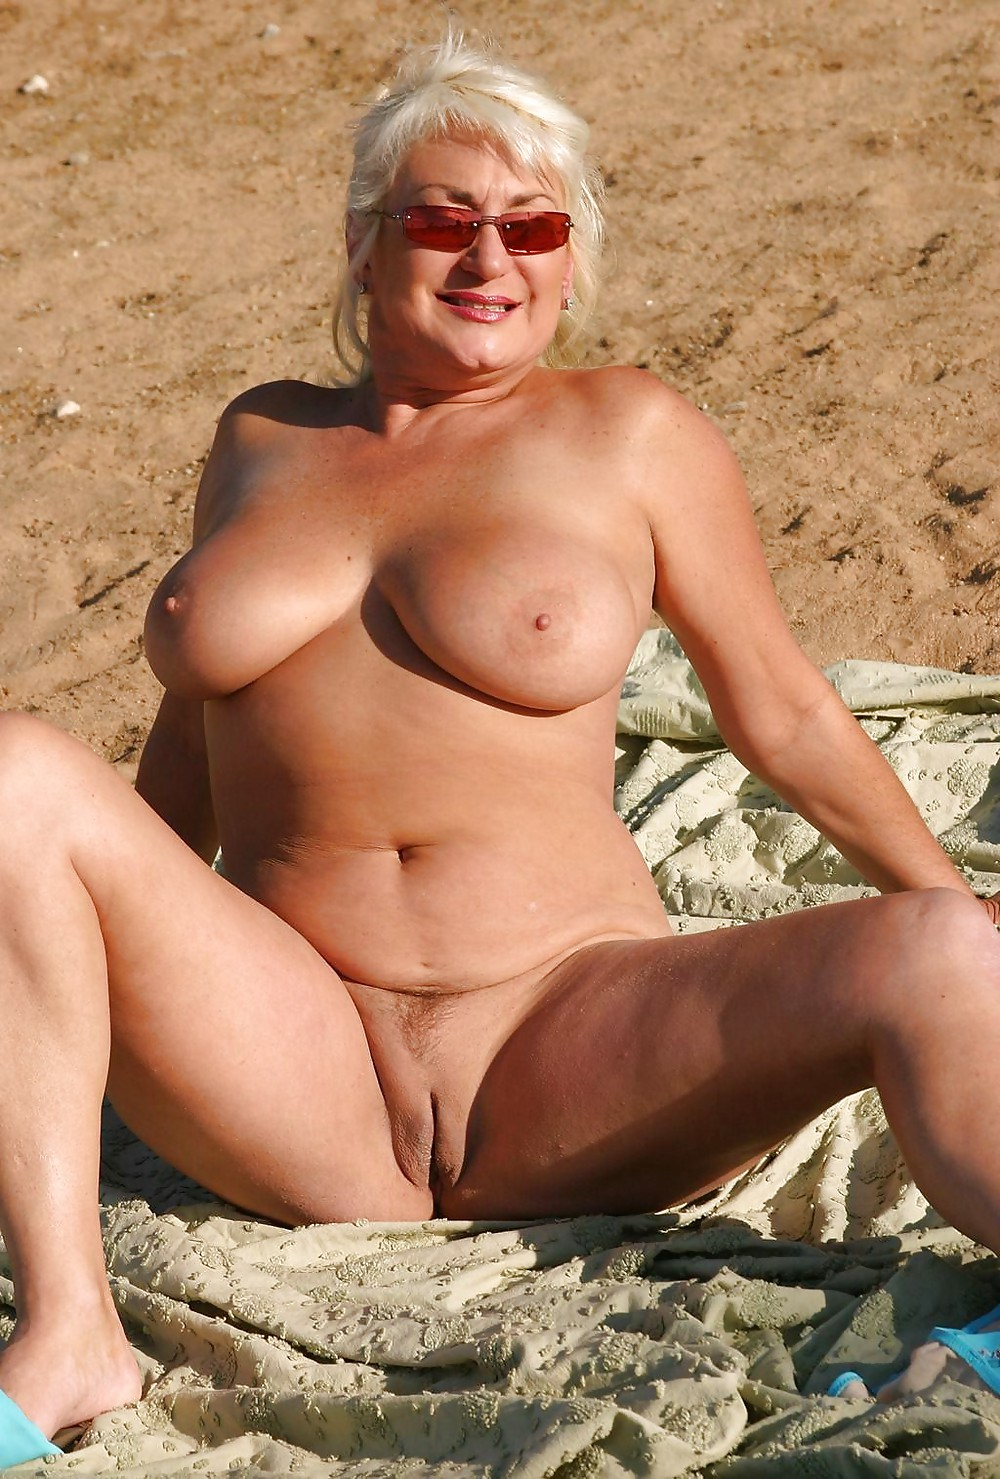 Real housewives stars hottest bikini moments